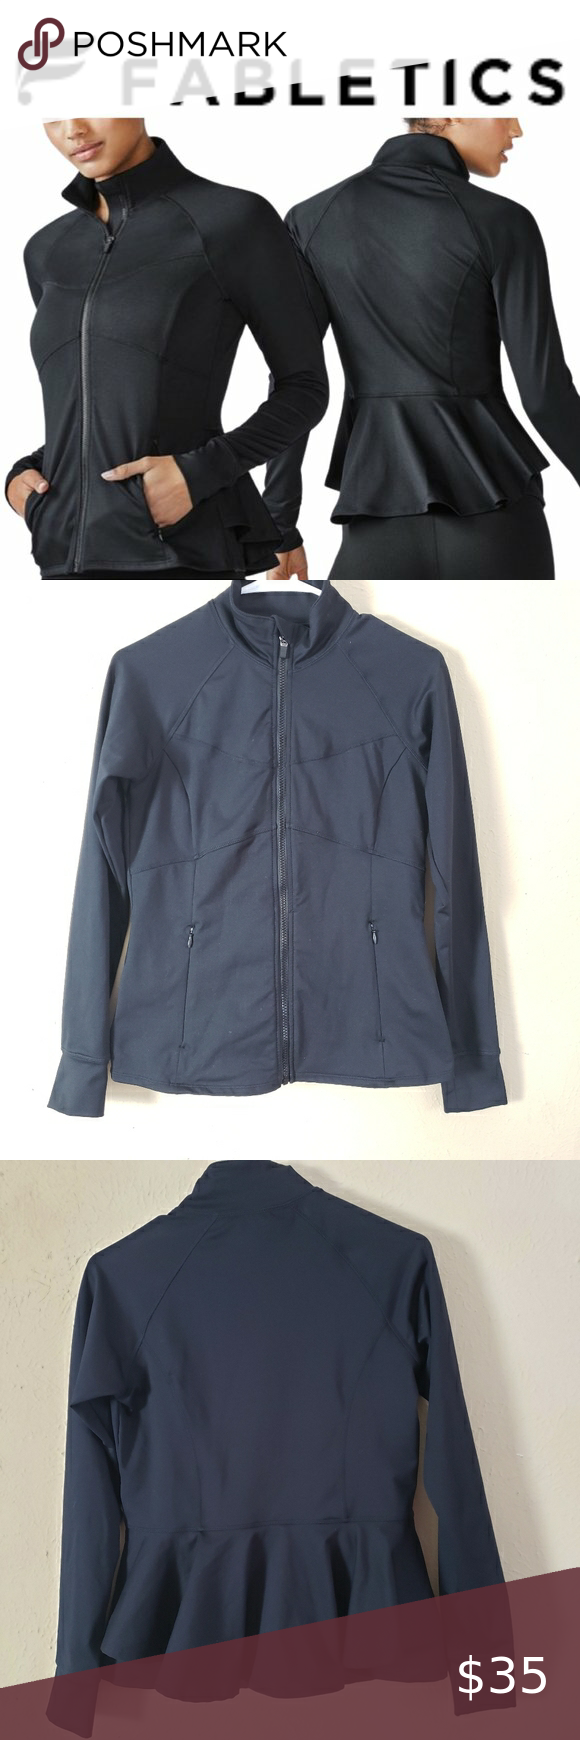 Fabletics Michaela Peplum Athletic Jacket Stylish Outerwear Athletic Jacket Jackets [ 1740 x 580 Pixel ]